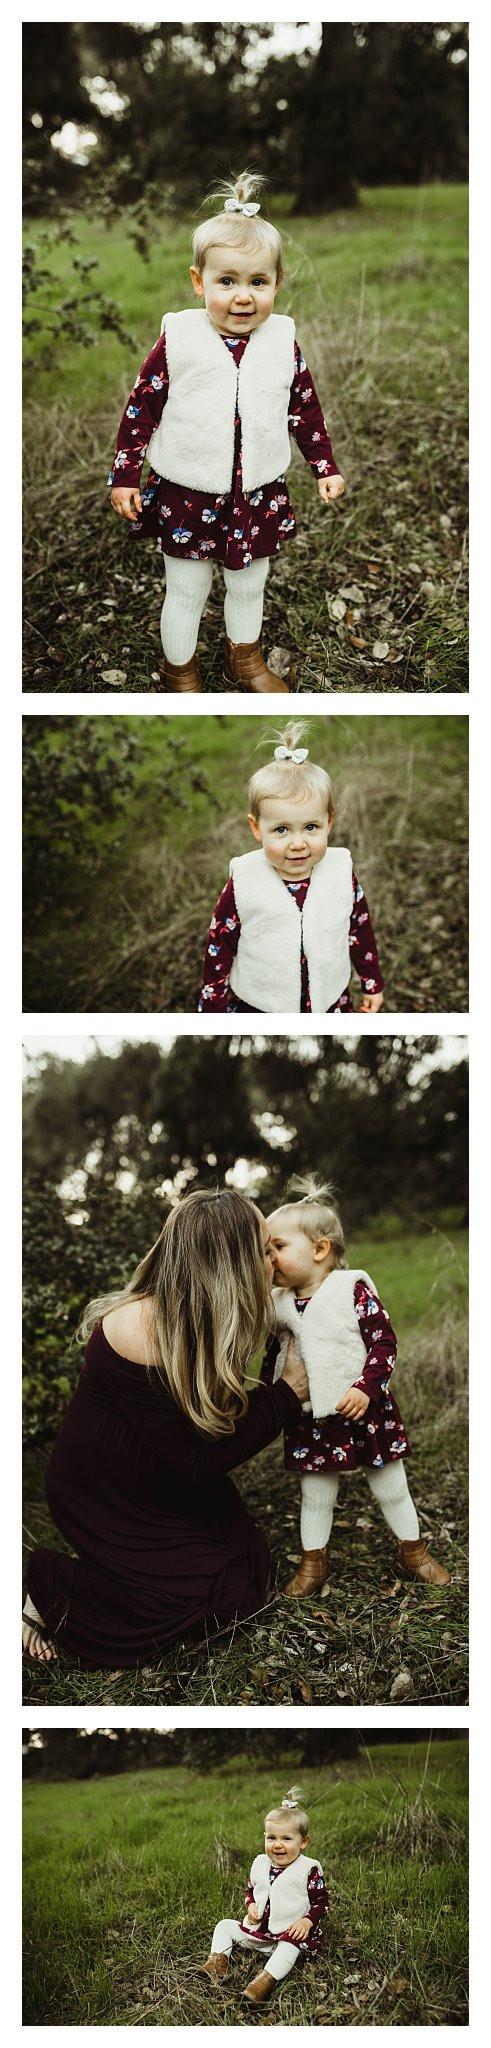 Felicita Park Maternity Portraits